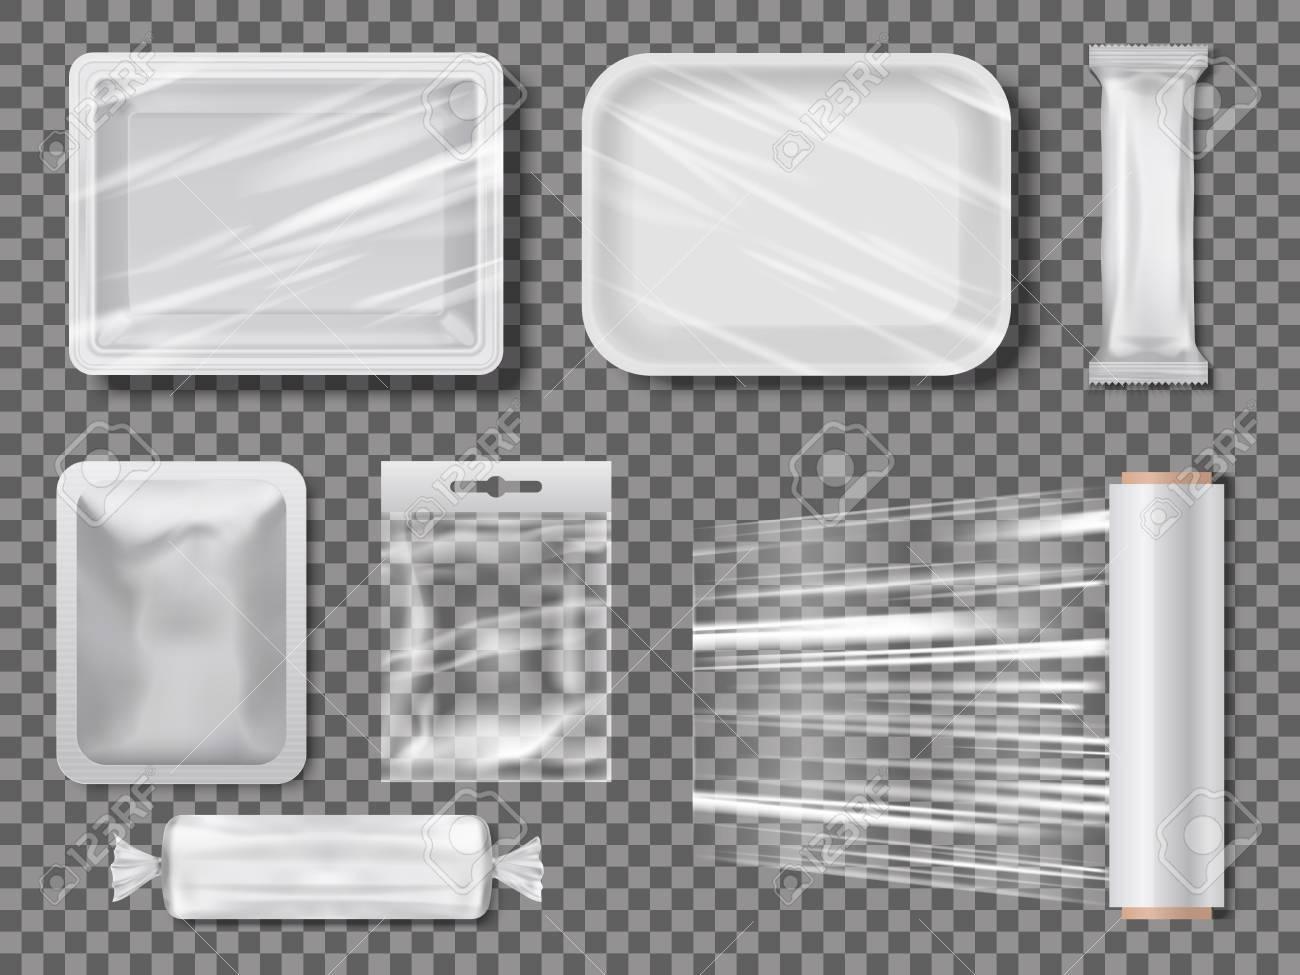 Transparent food packages from polythene illustration. - 96835294